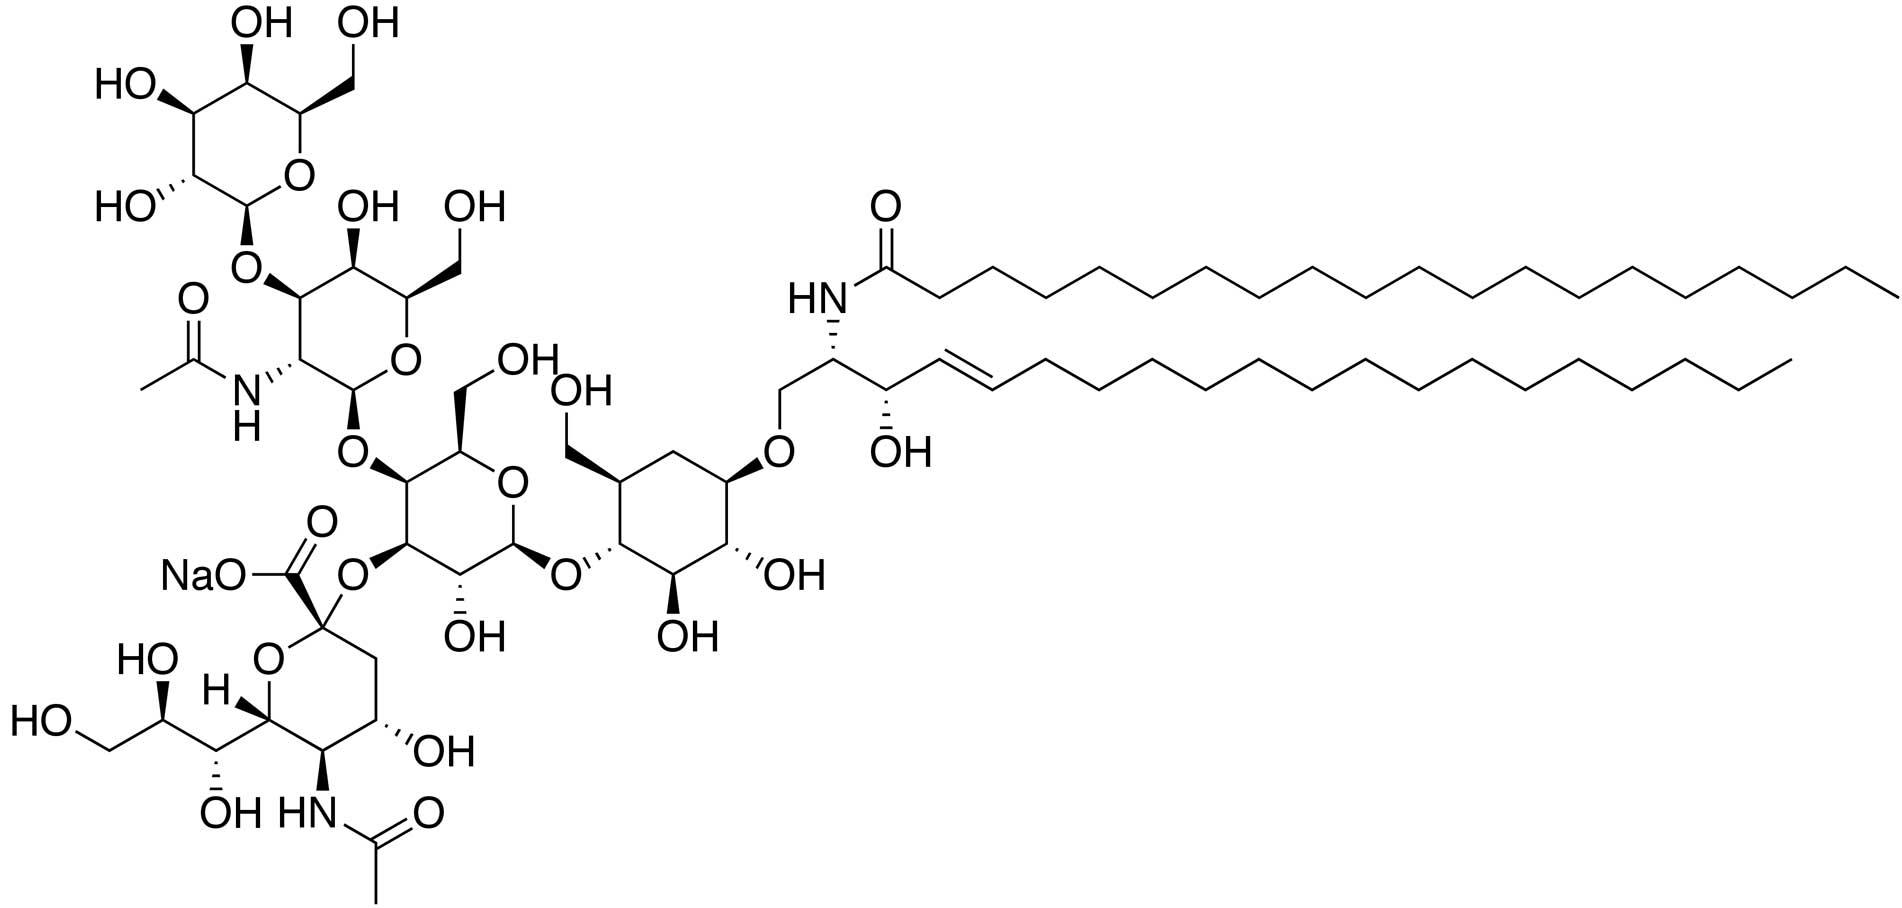 Protective Effects Of Monosialotetrahexosylganglioside Sodium On H2o2 Induced Human Vascular